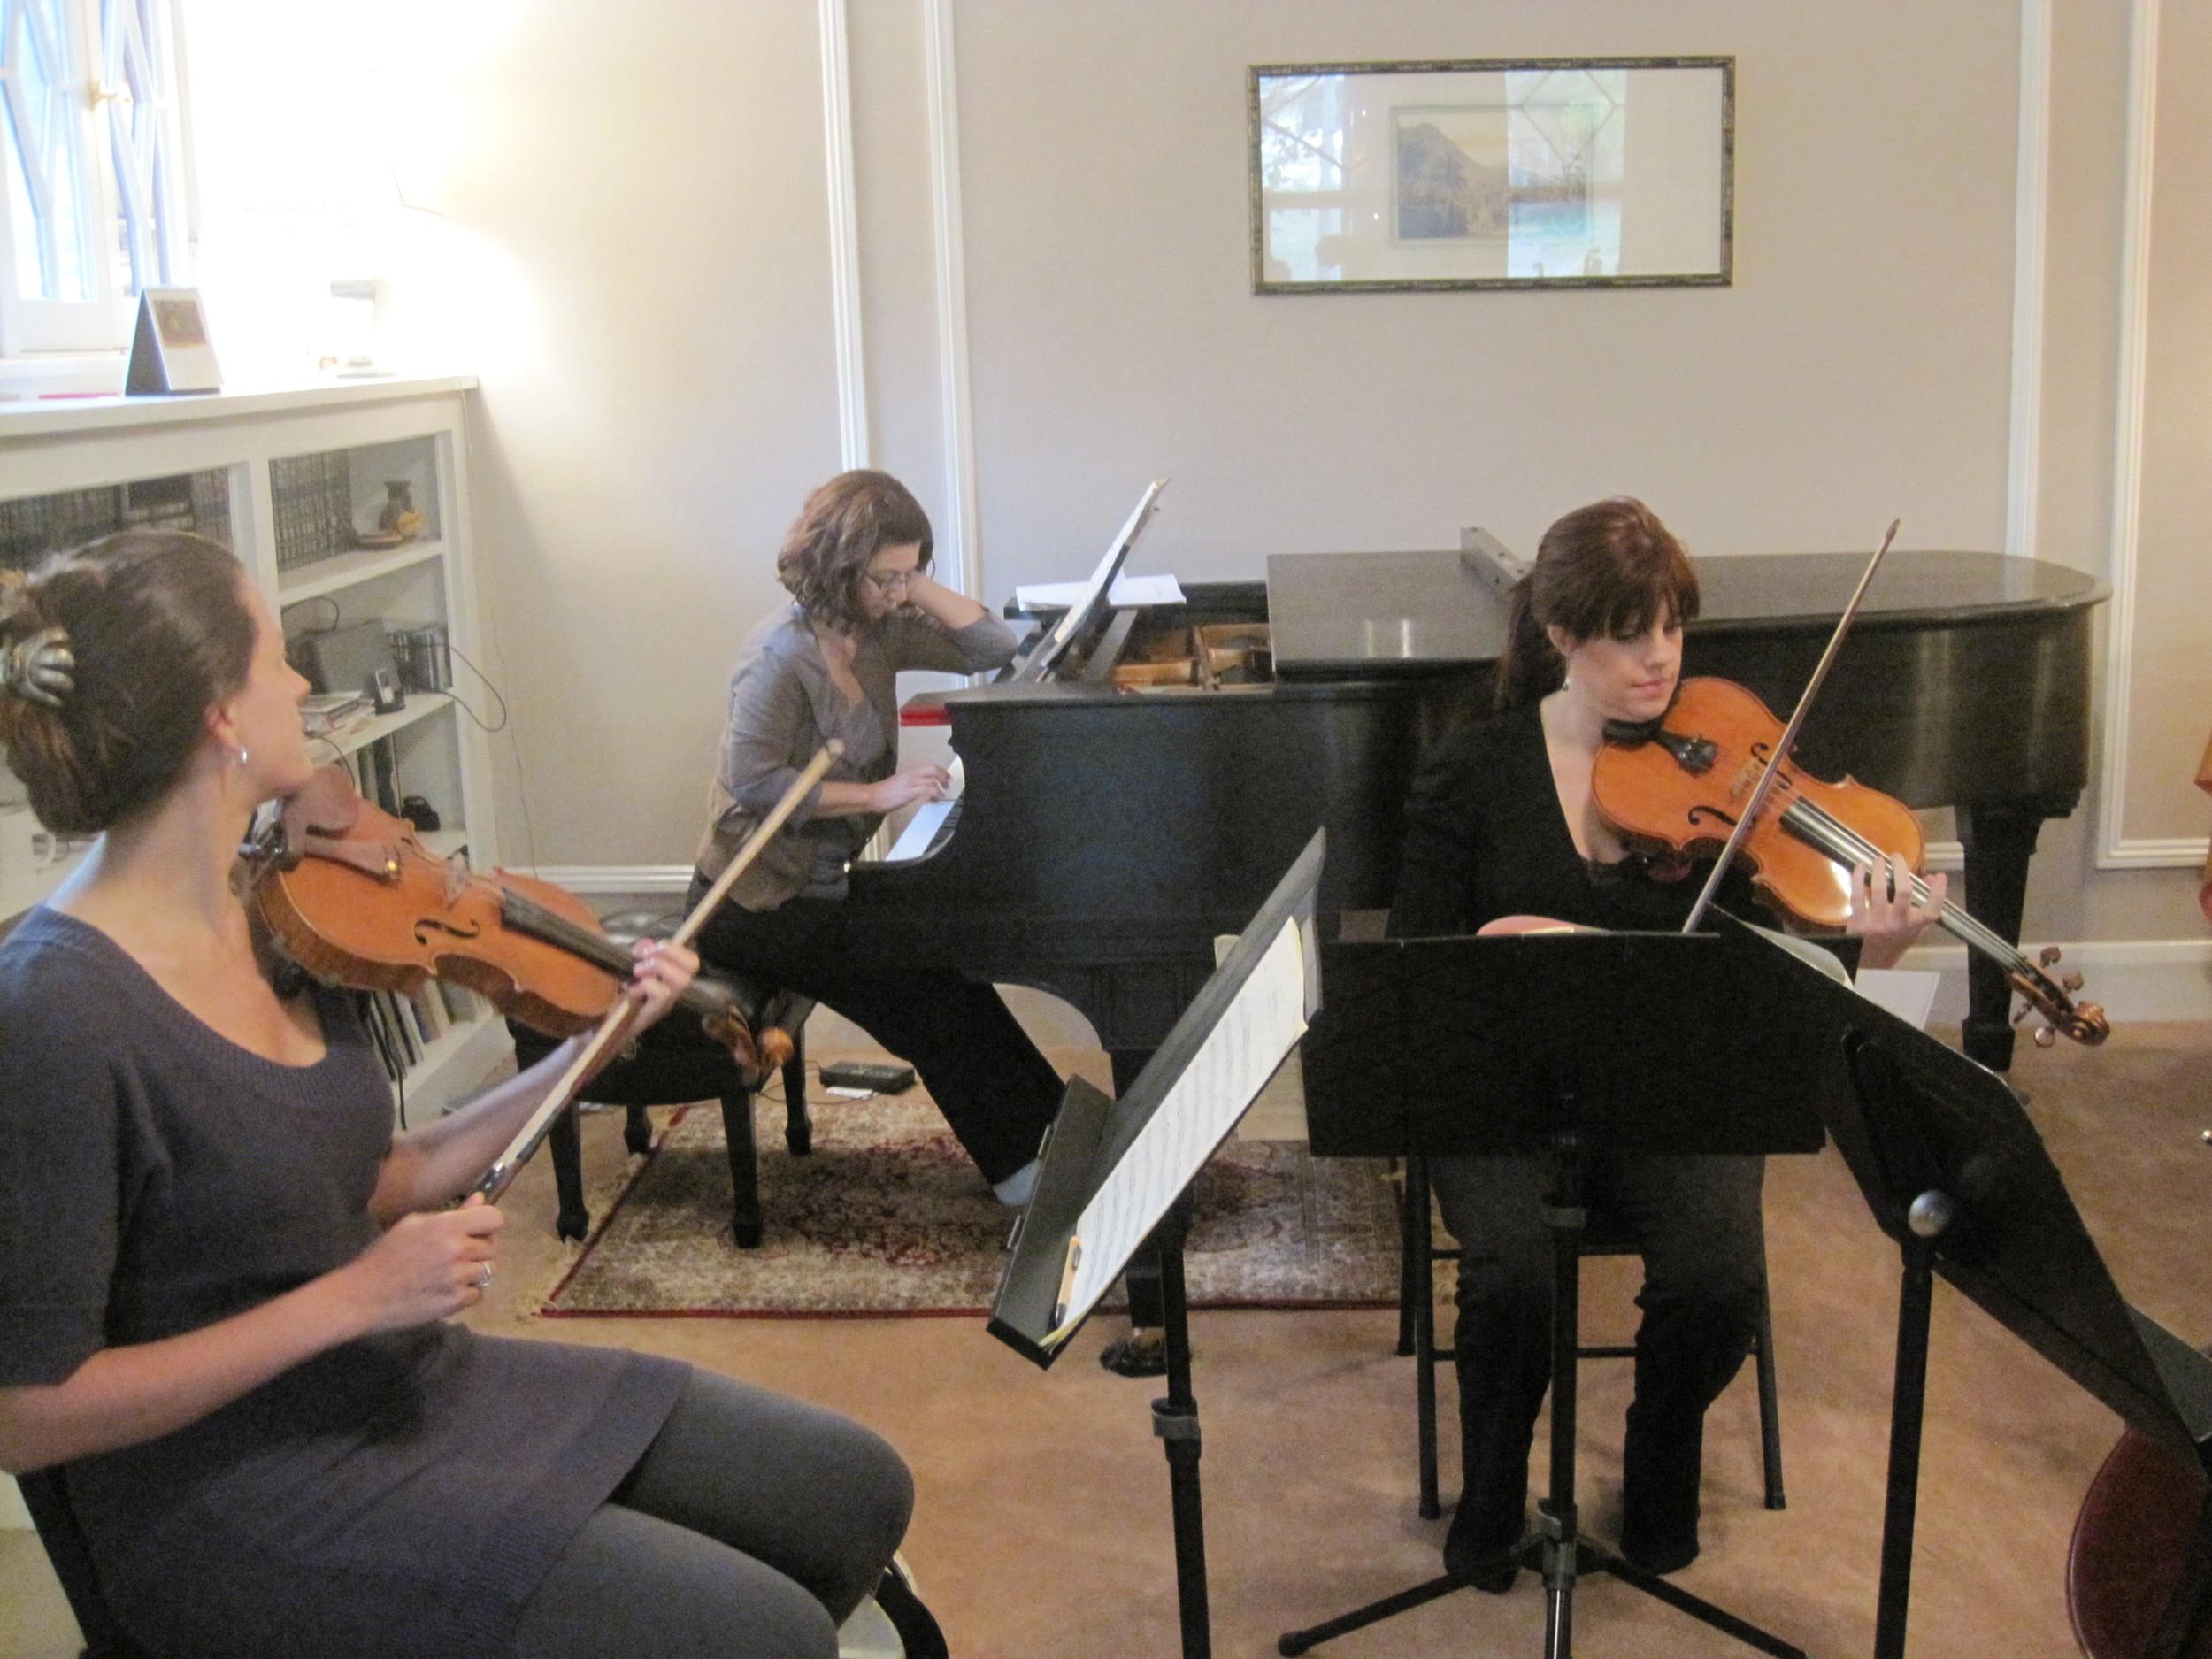 Musicians tuning